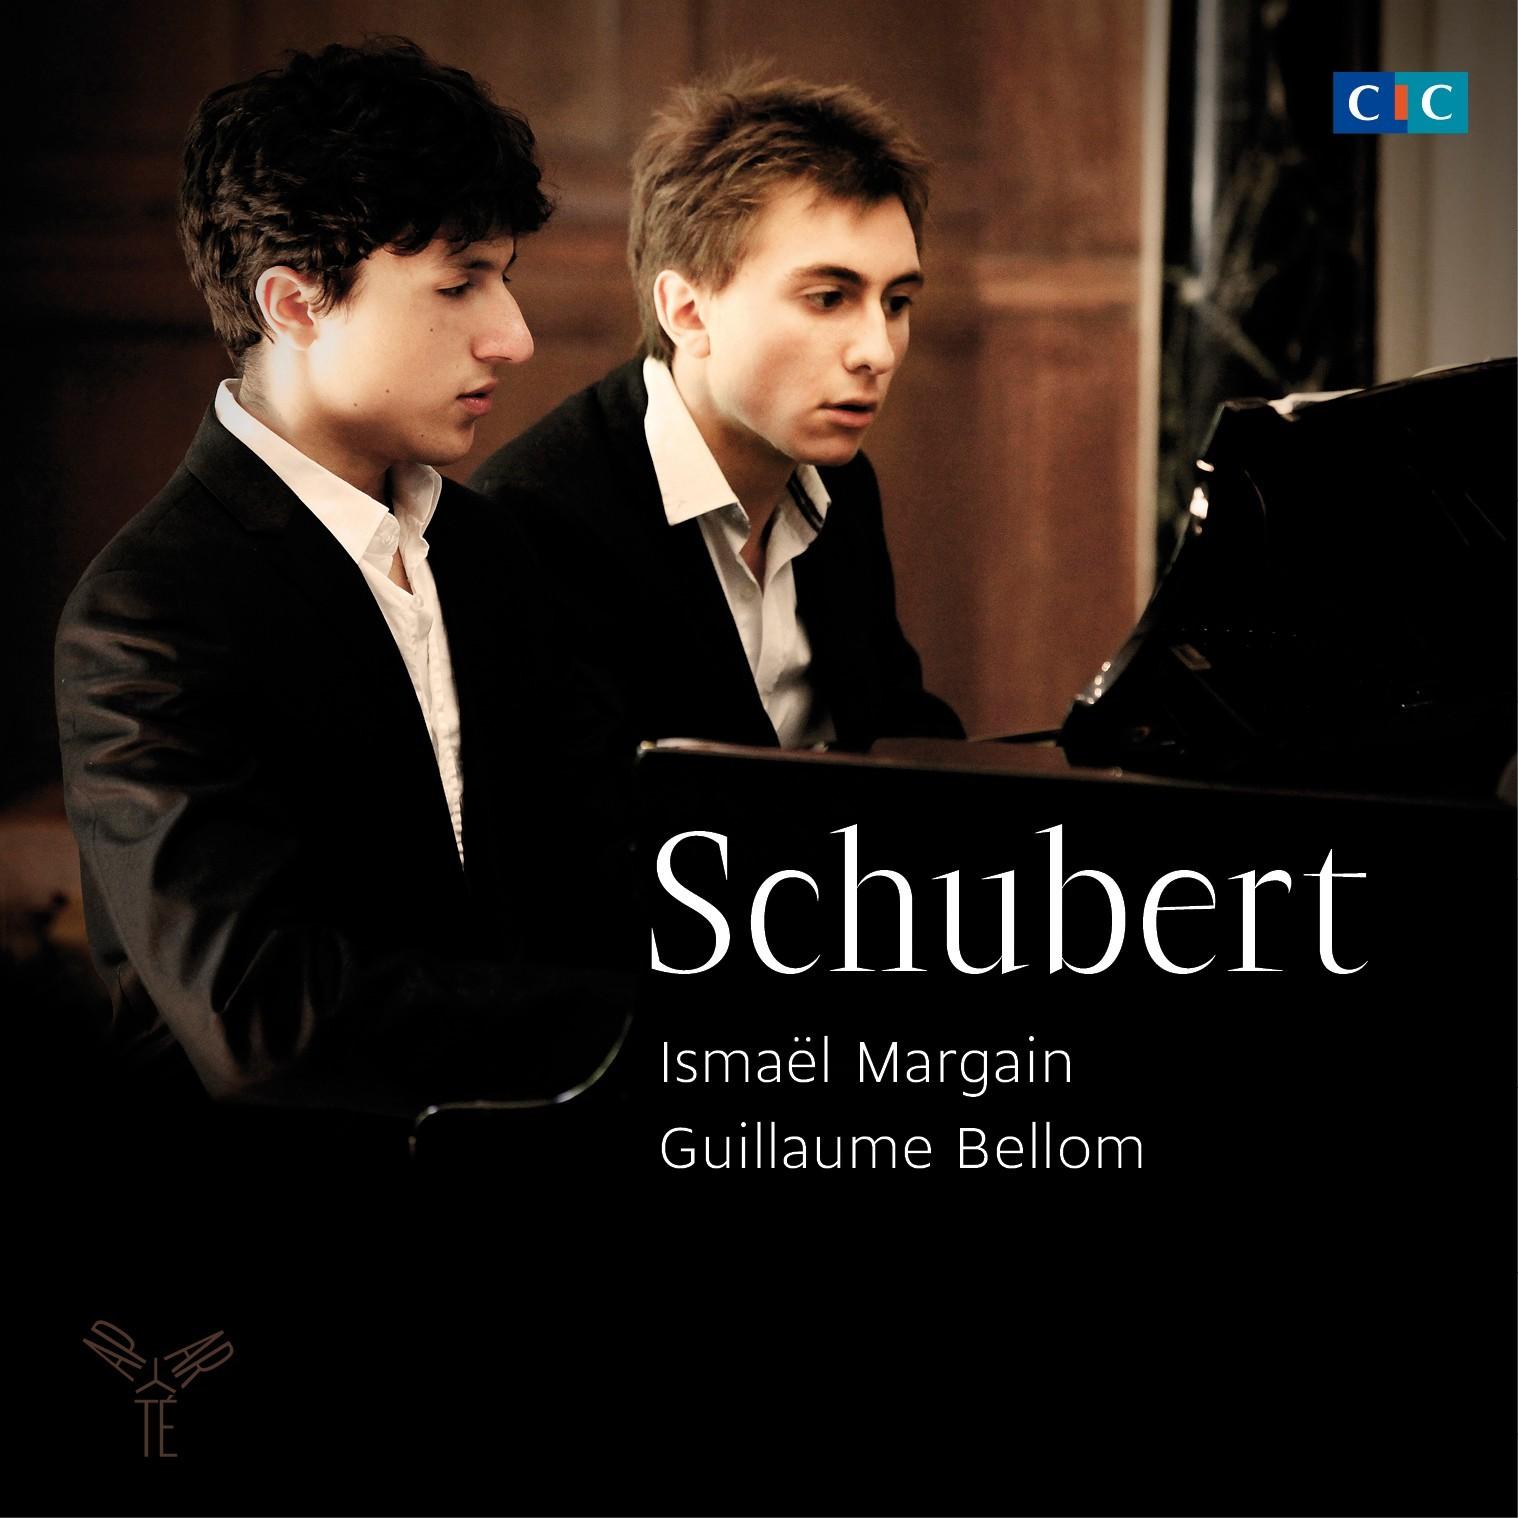 Schubert: Piano four hands